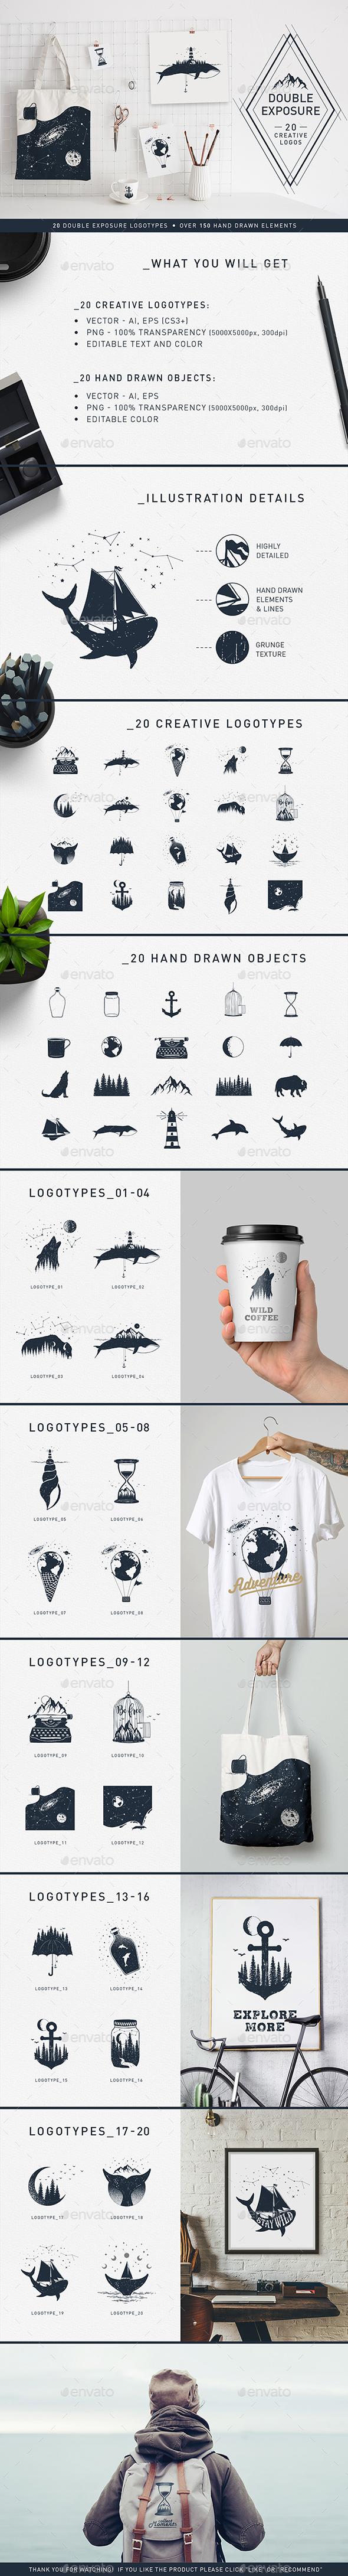 Double Exposure. 20 Creative Logos - Vectors